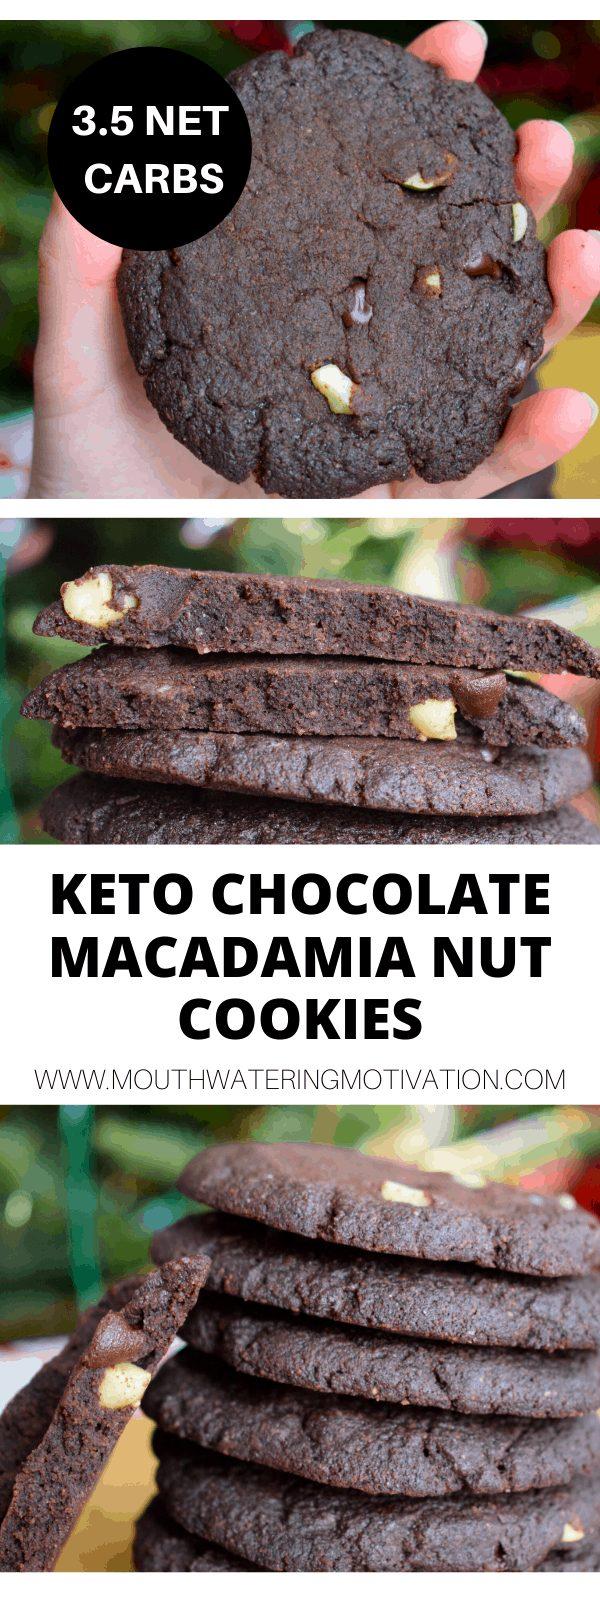 KETO CHOCOLATE MACADAMIA NUT COOKIES (2).png